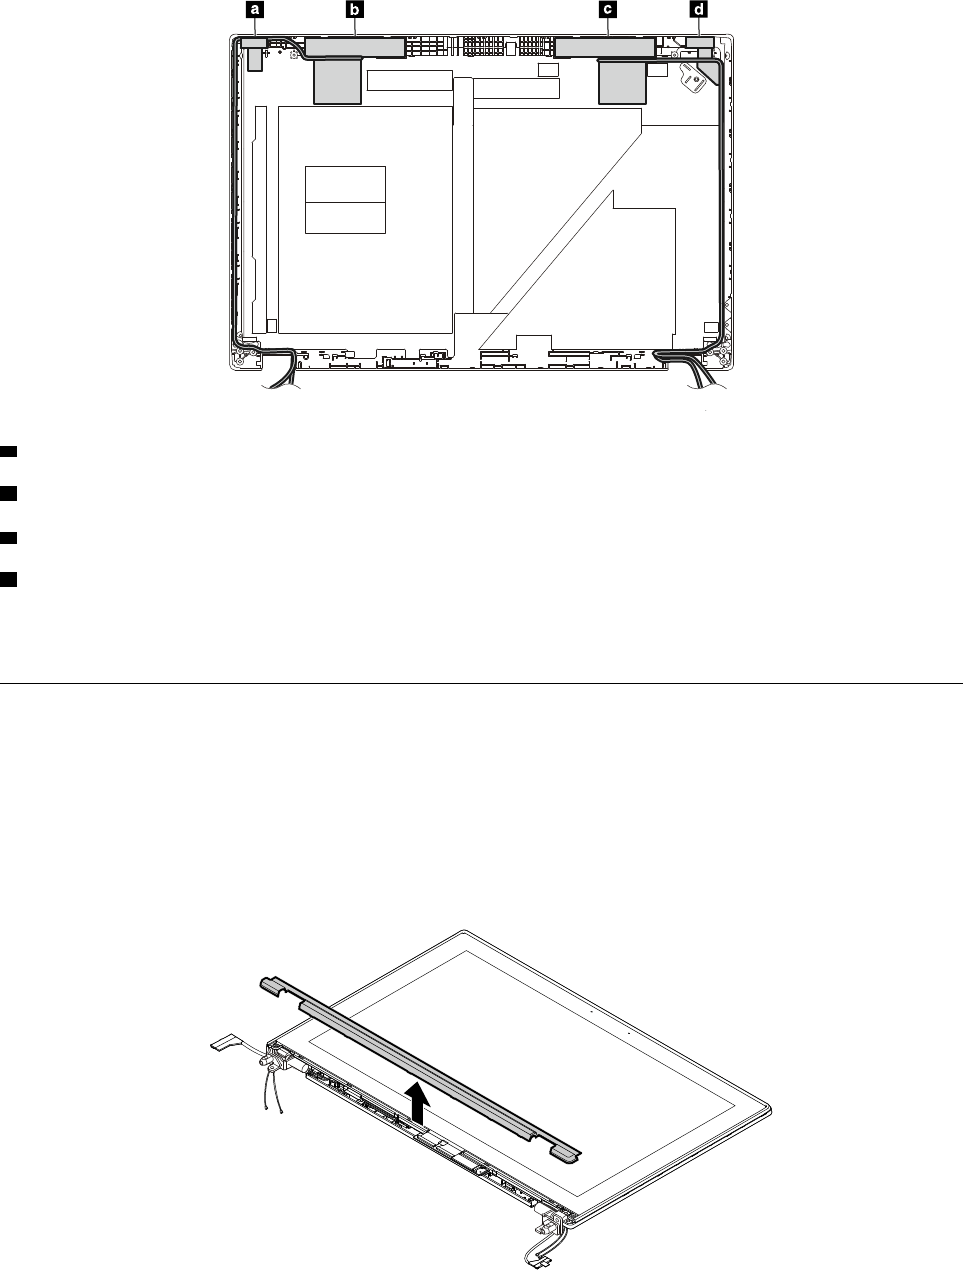 Lenovo ThinkPad P52 Hardware Maintenance Manual (English